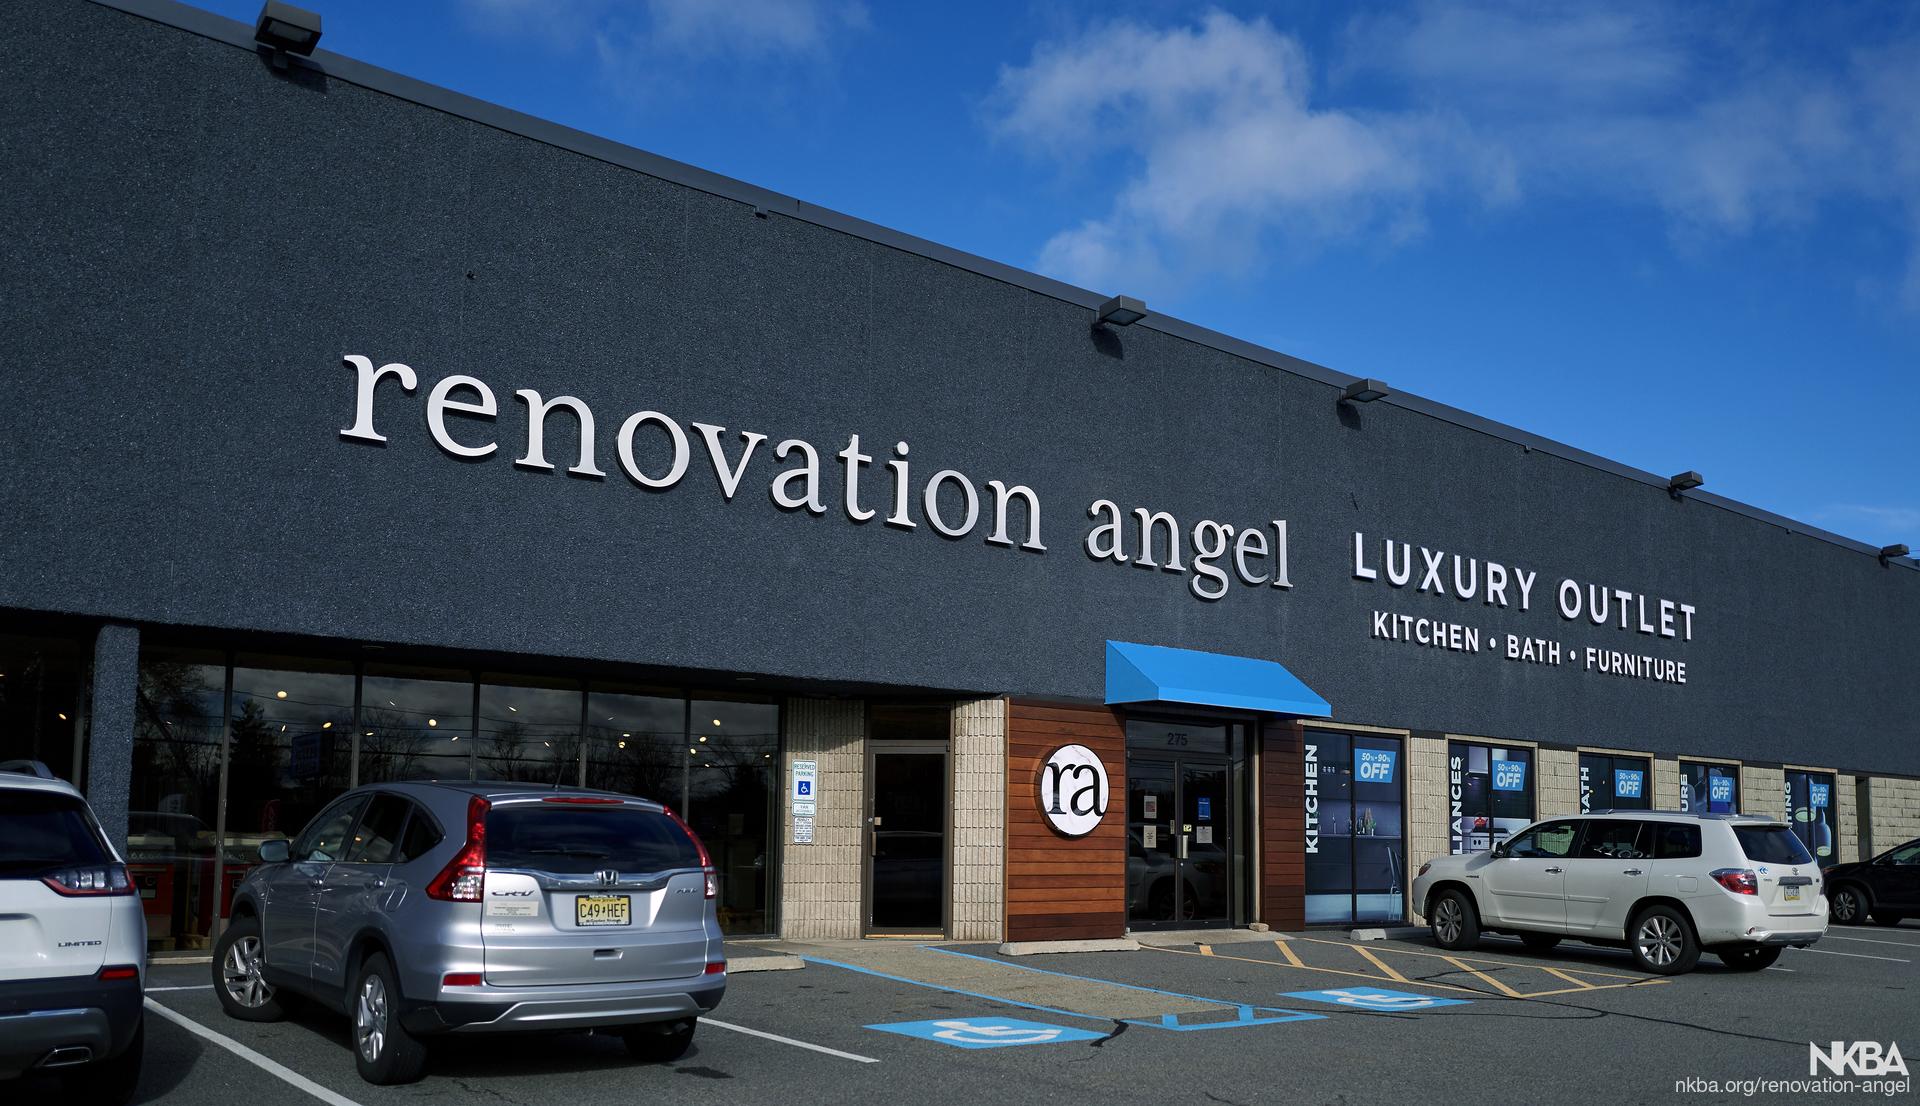 Renovation Angel Nkba